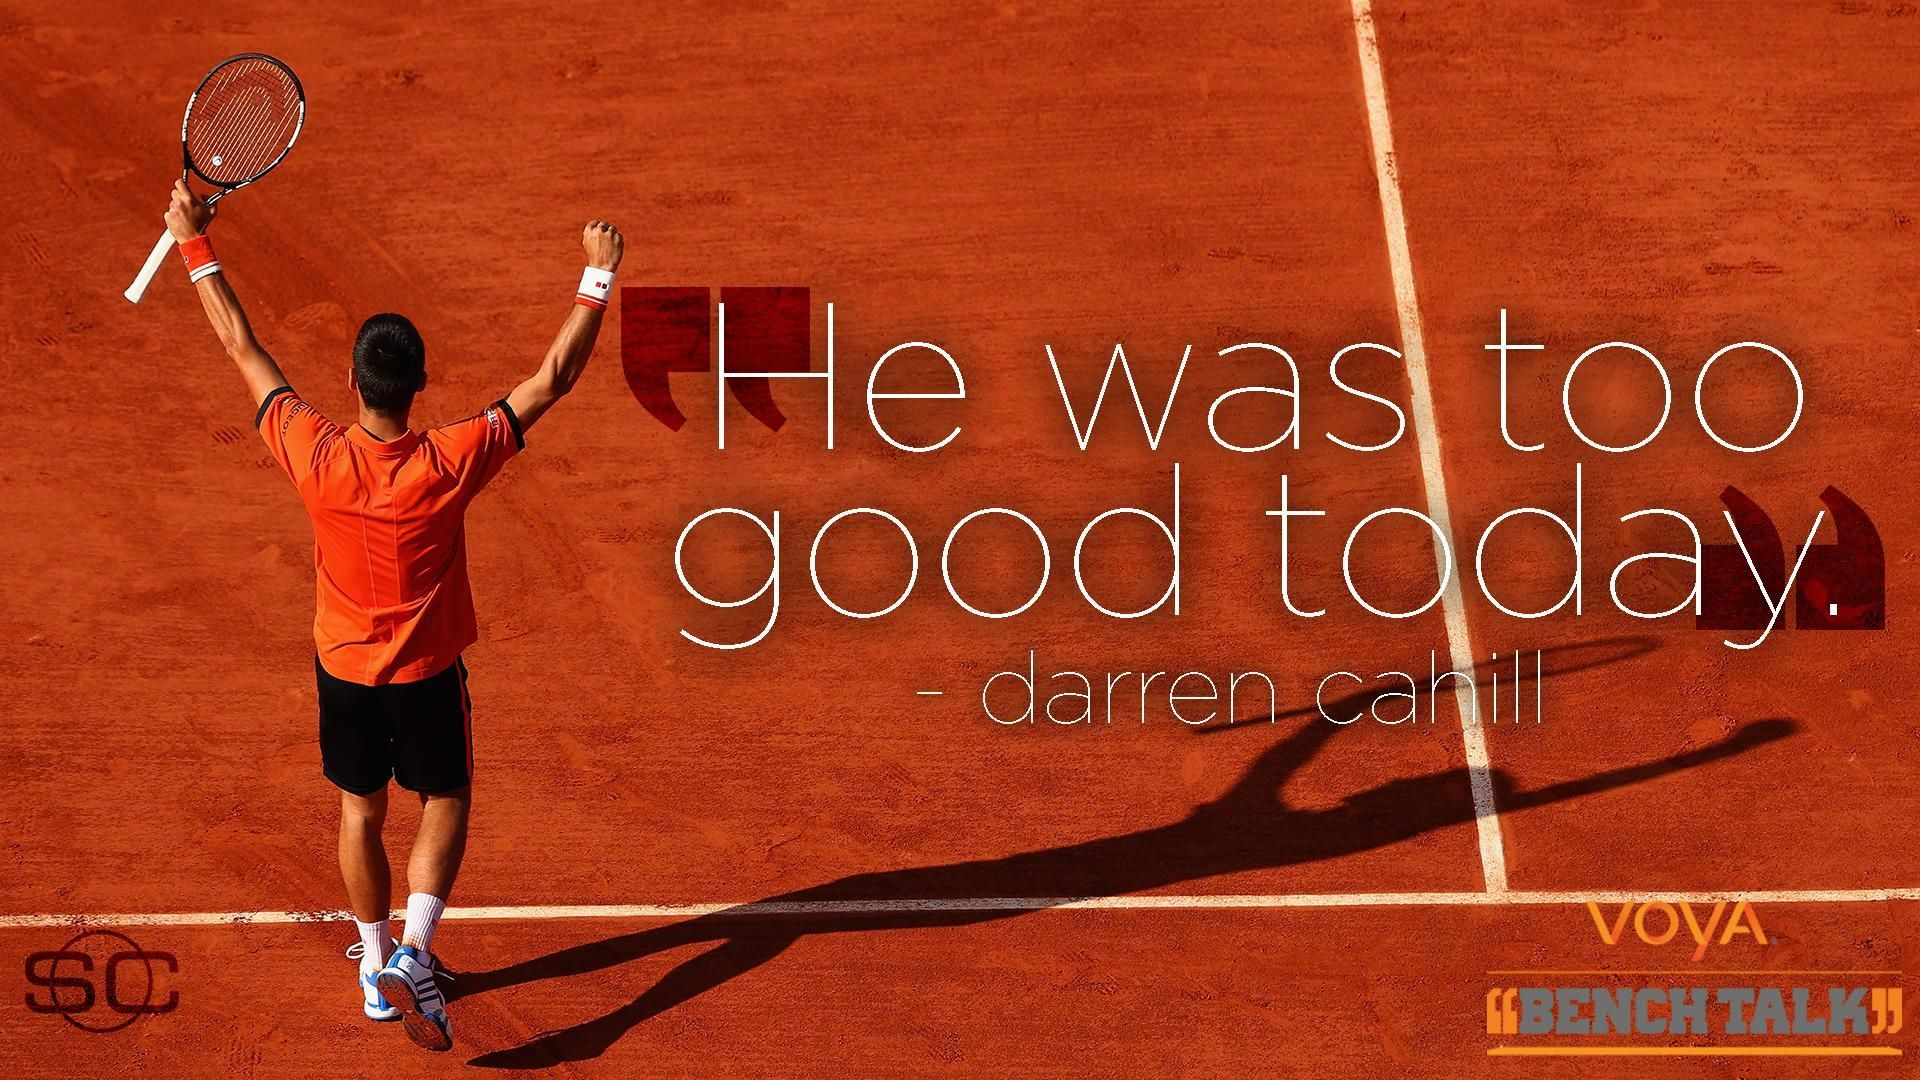 Breaking down Djoker's domination of Nadal